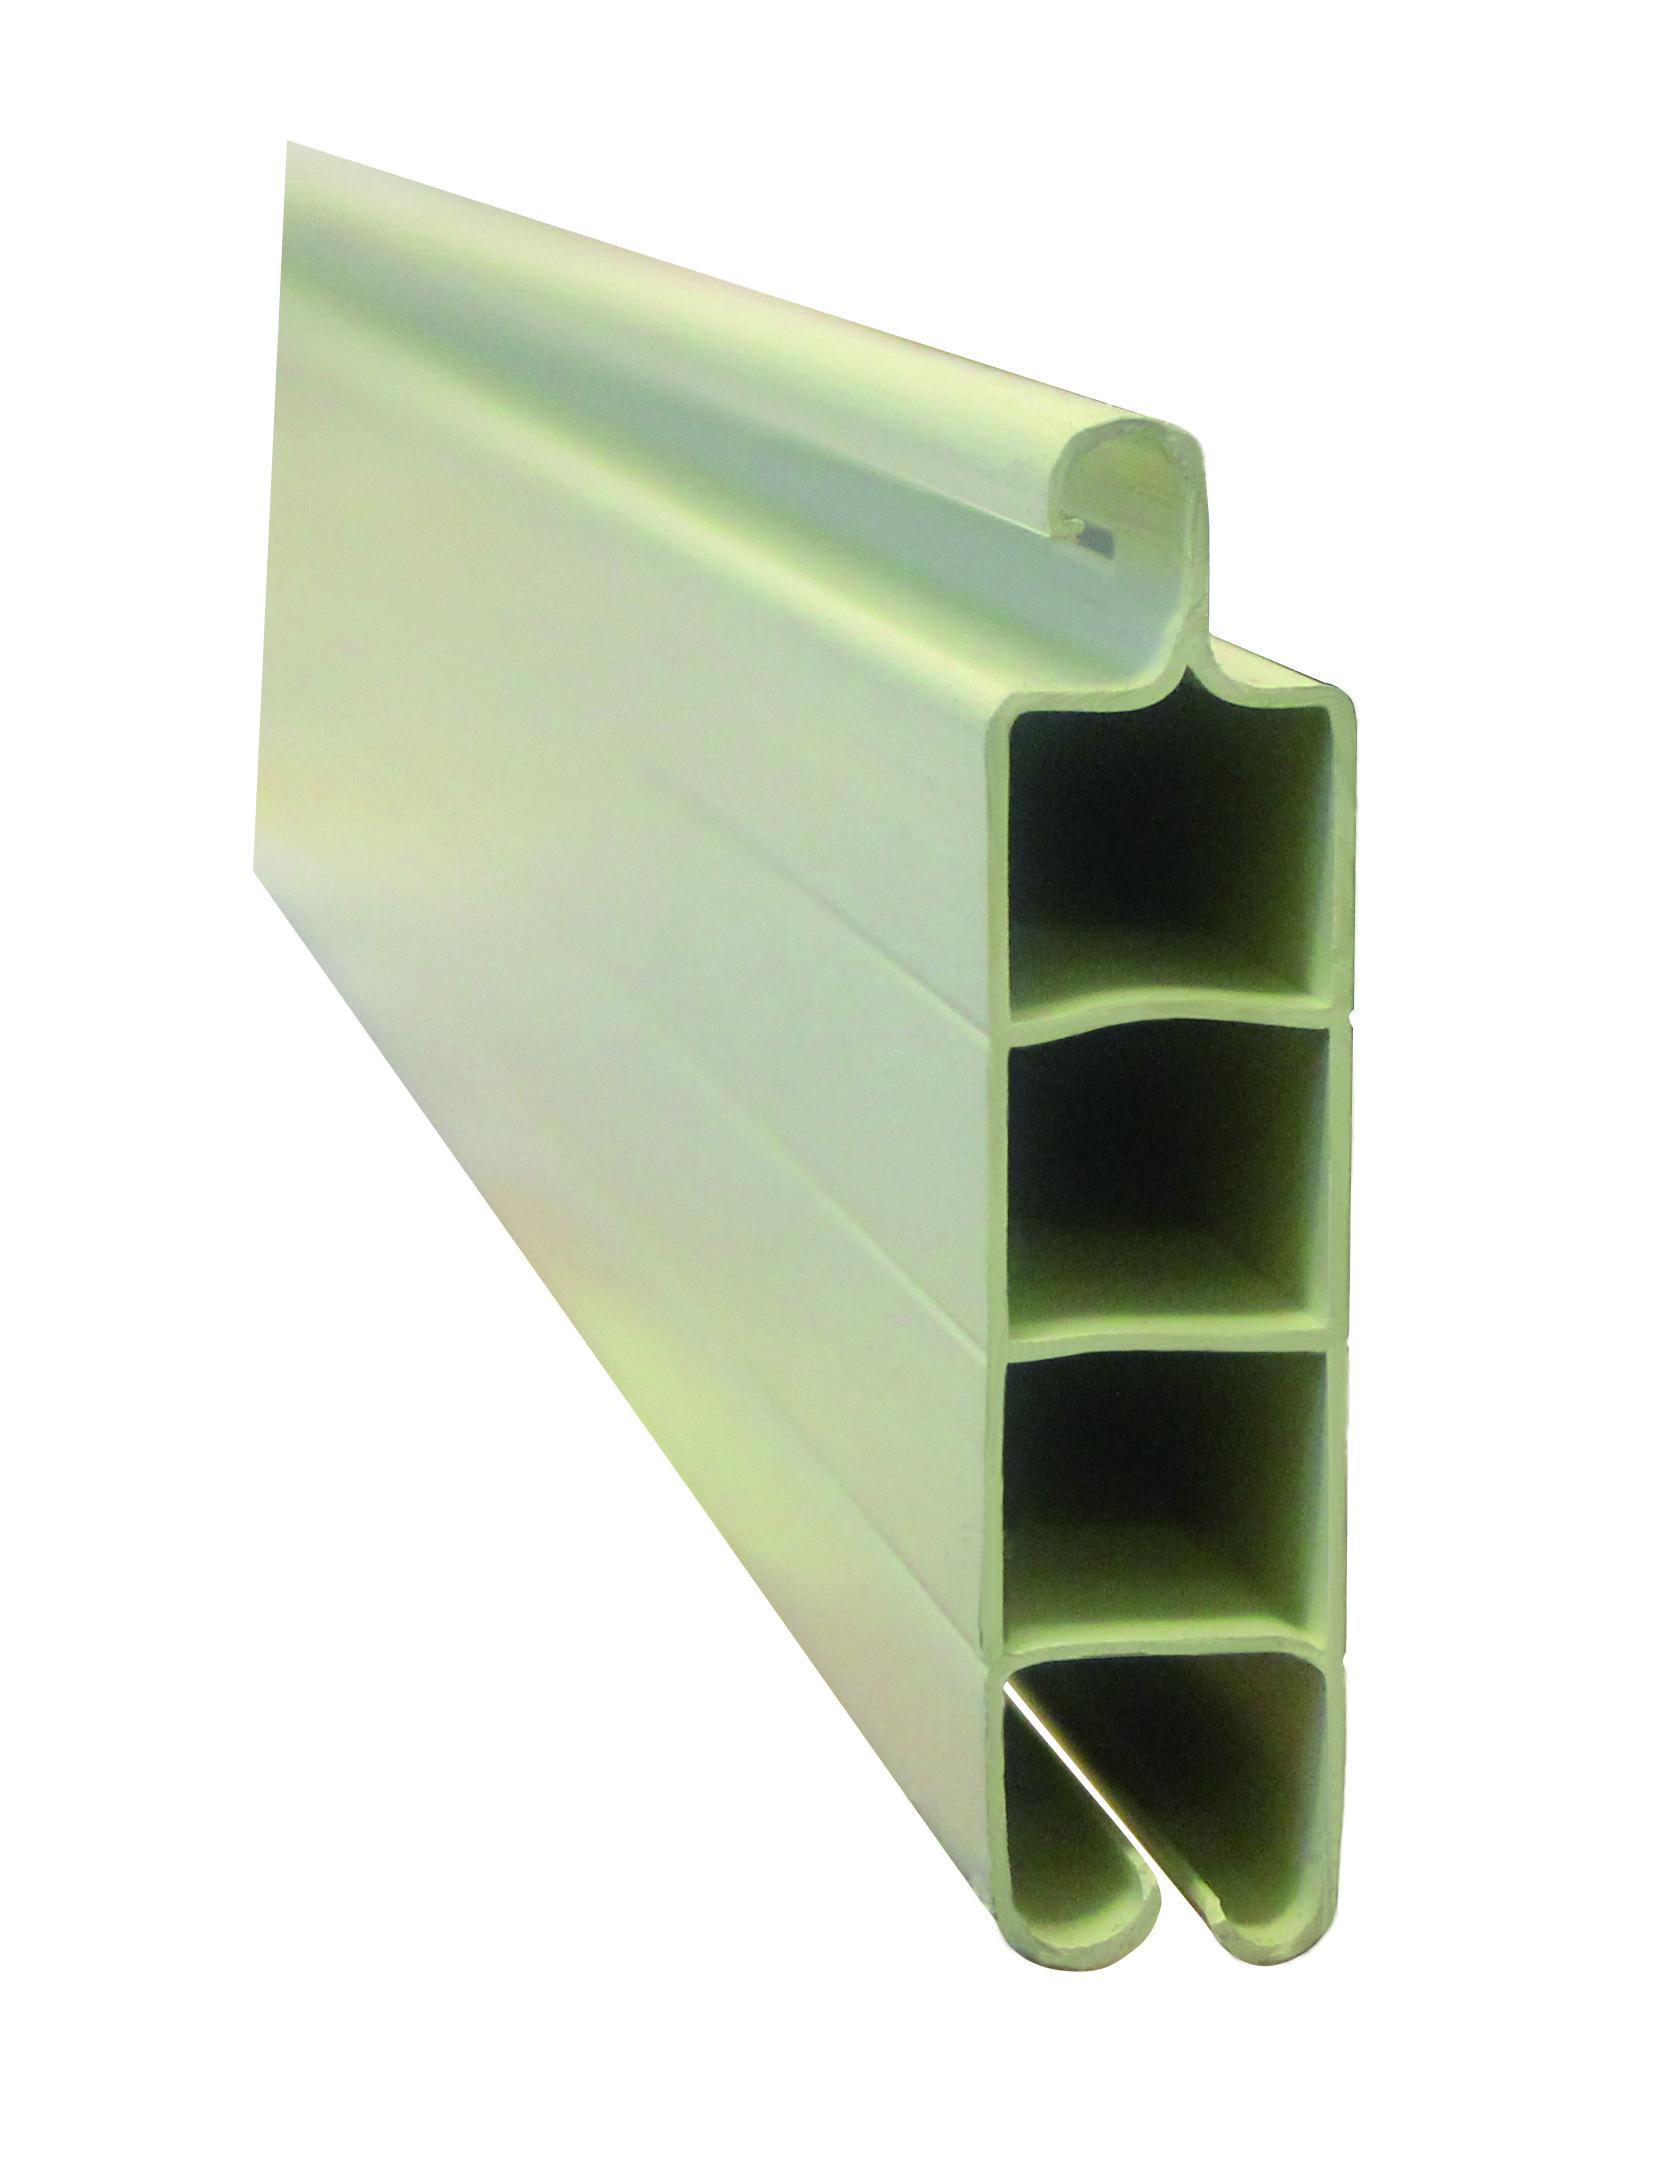 Rollladenprofil Aus Kunststoff 2m Beige F R Spanien